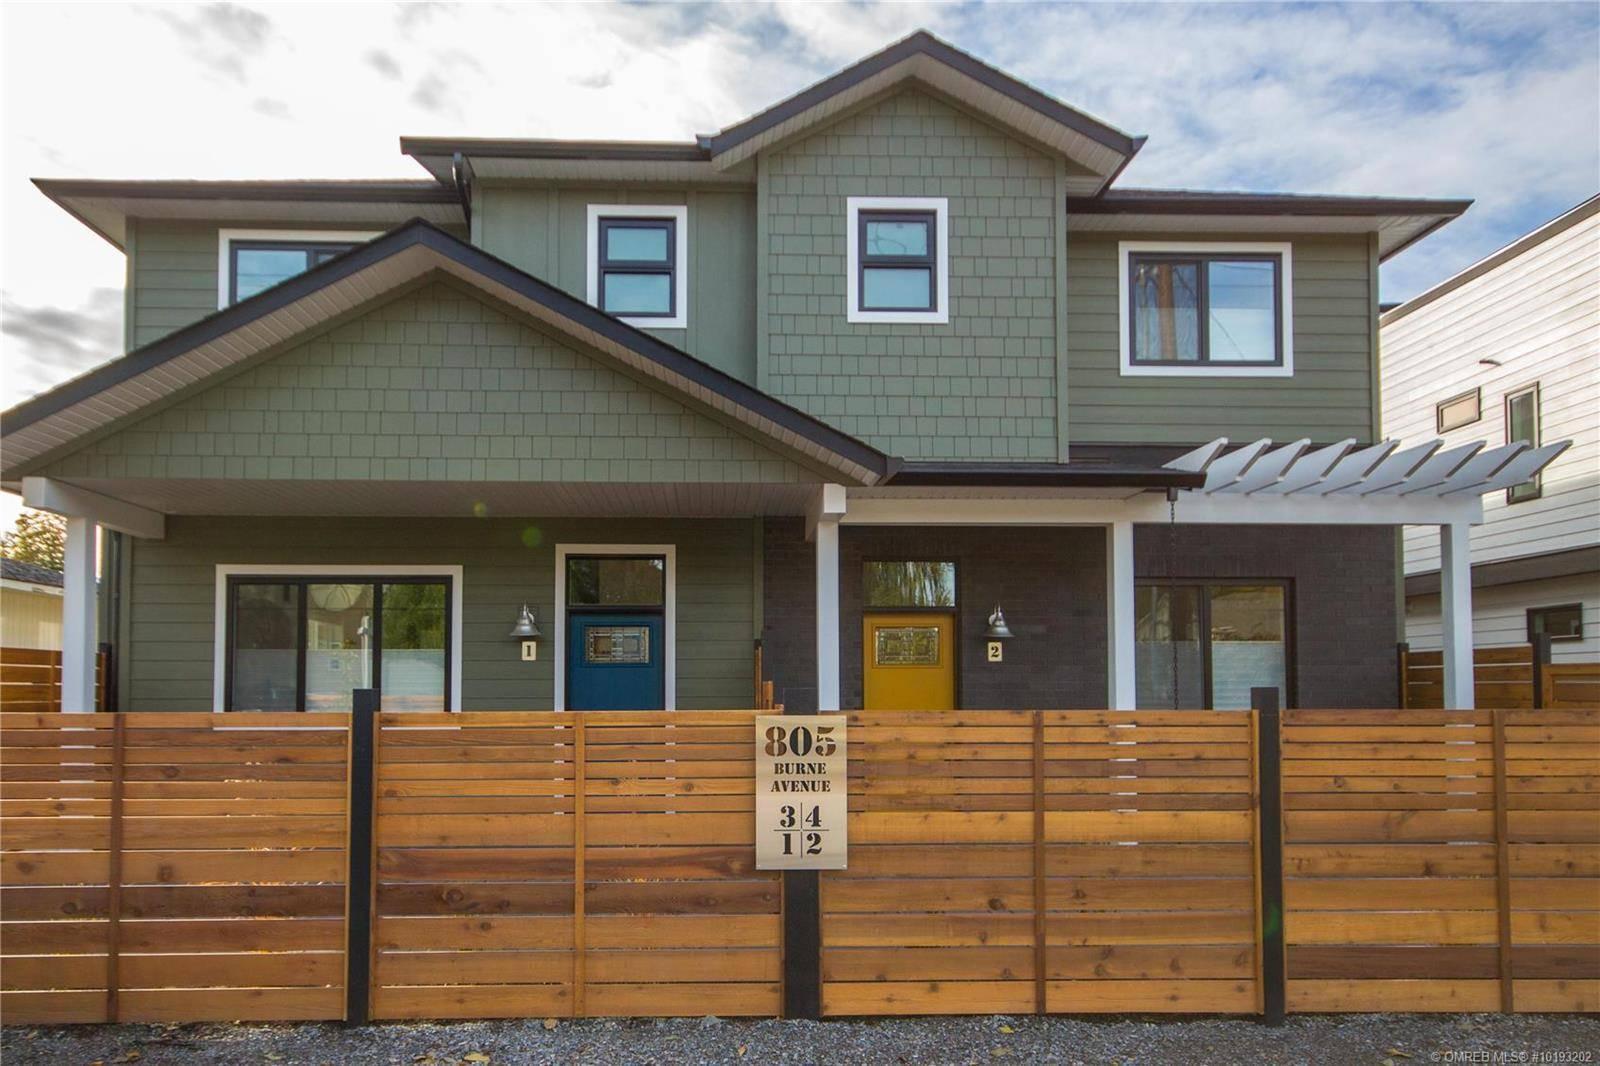 Townhouse for sale at 805 Burne Ave Unit 1 Kelowna British Columbia - MLS: 10193202